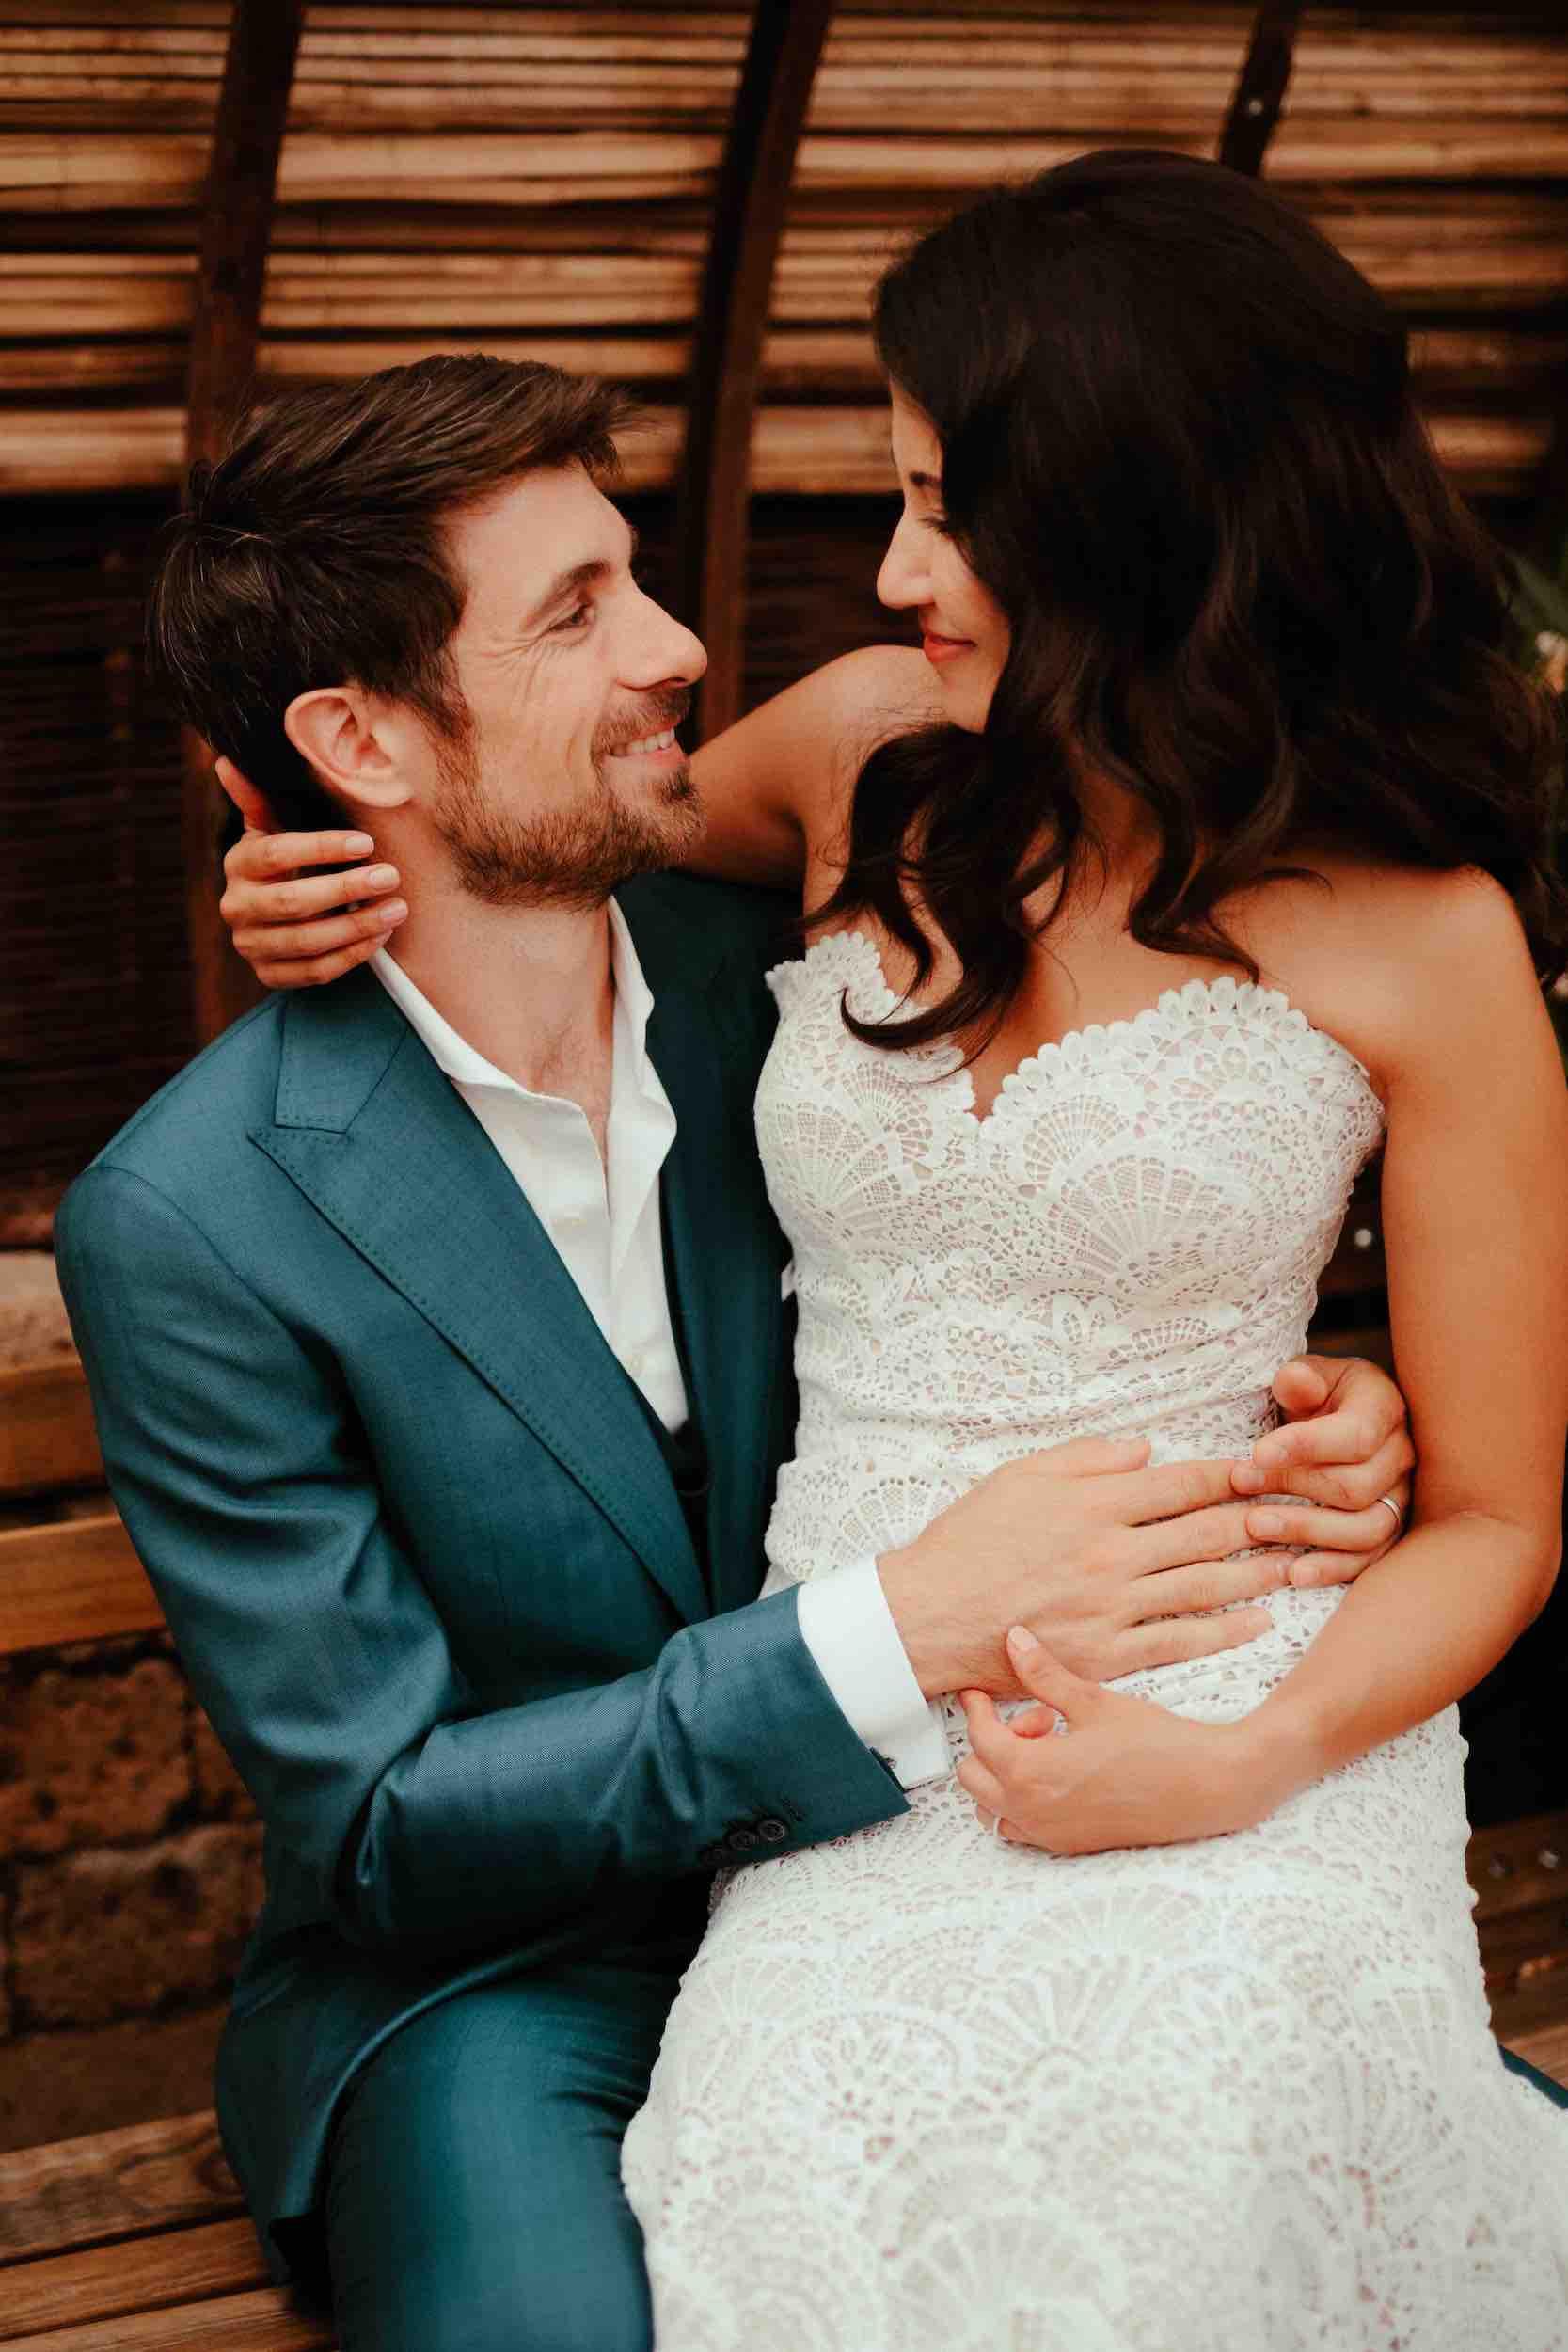 Wedding image - Dalbiondo wedding attire